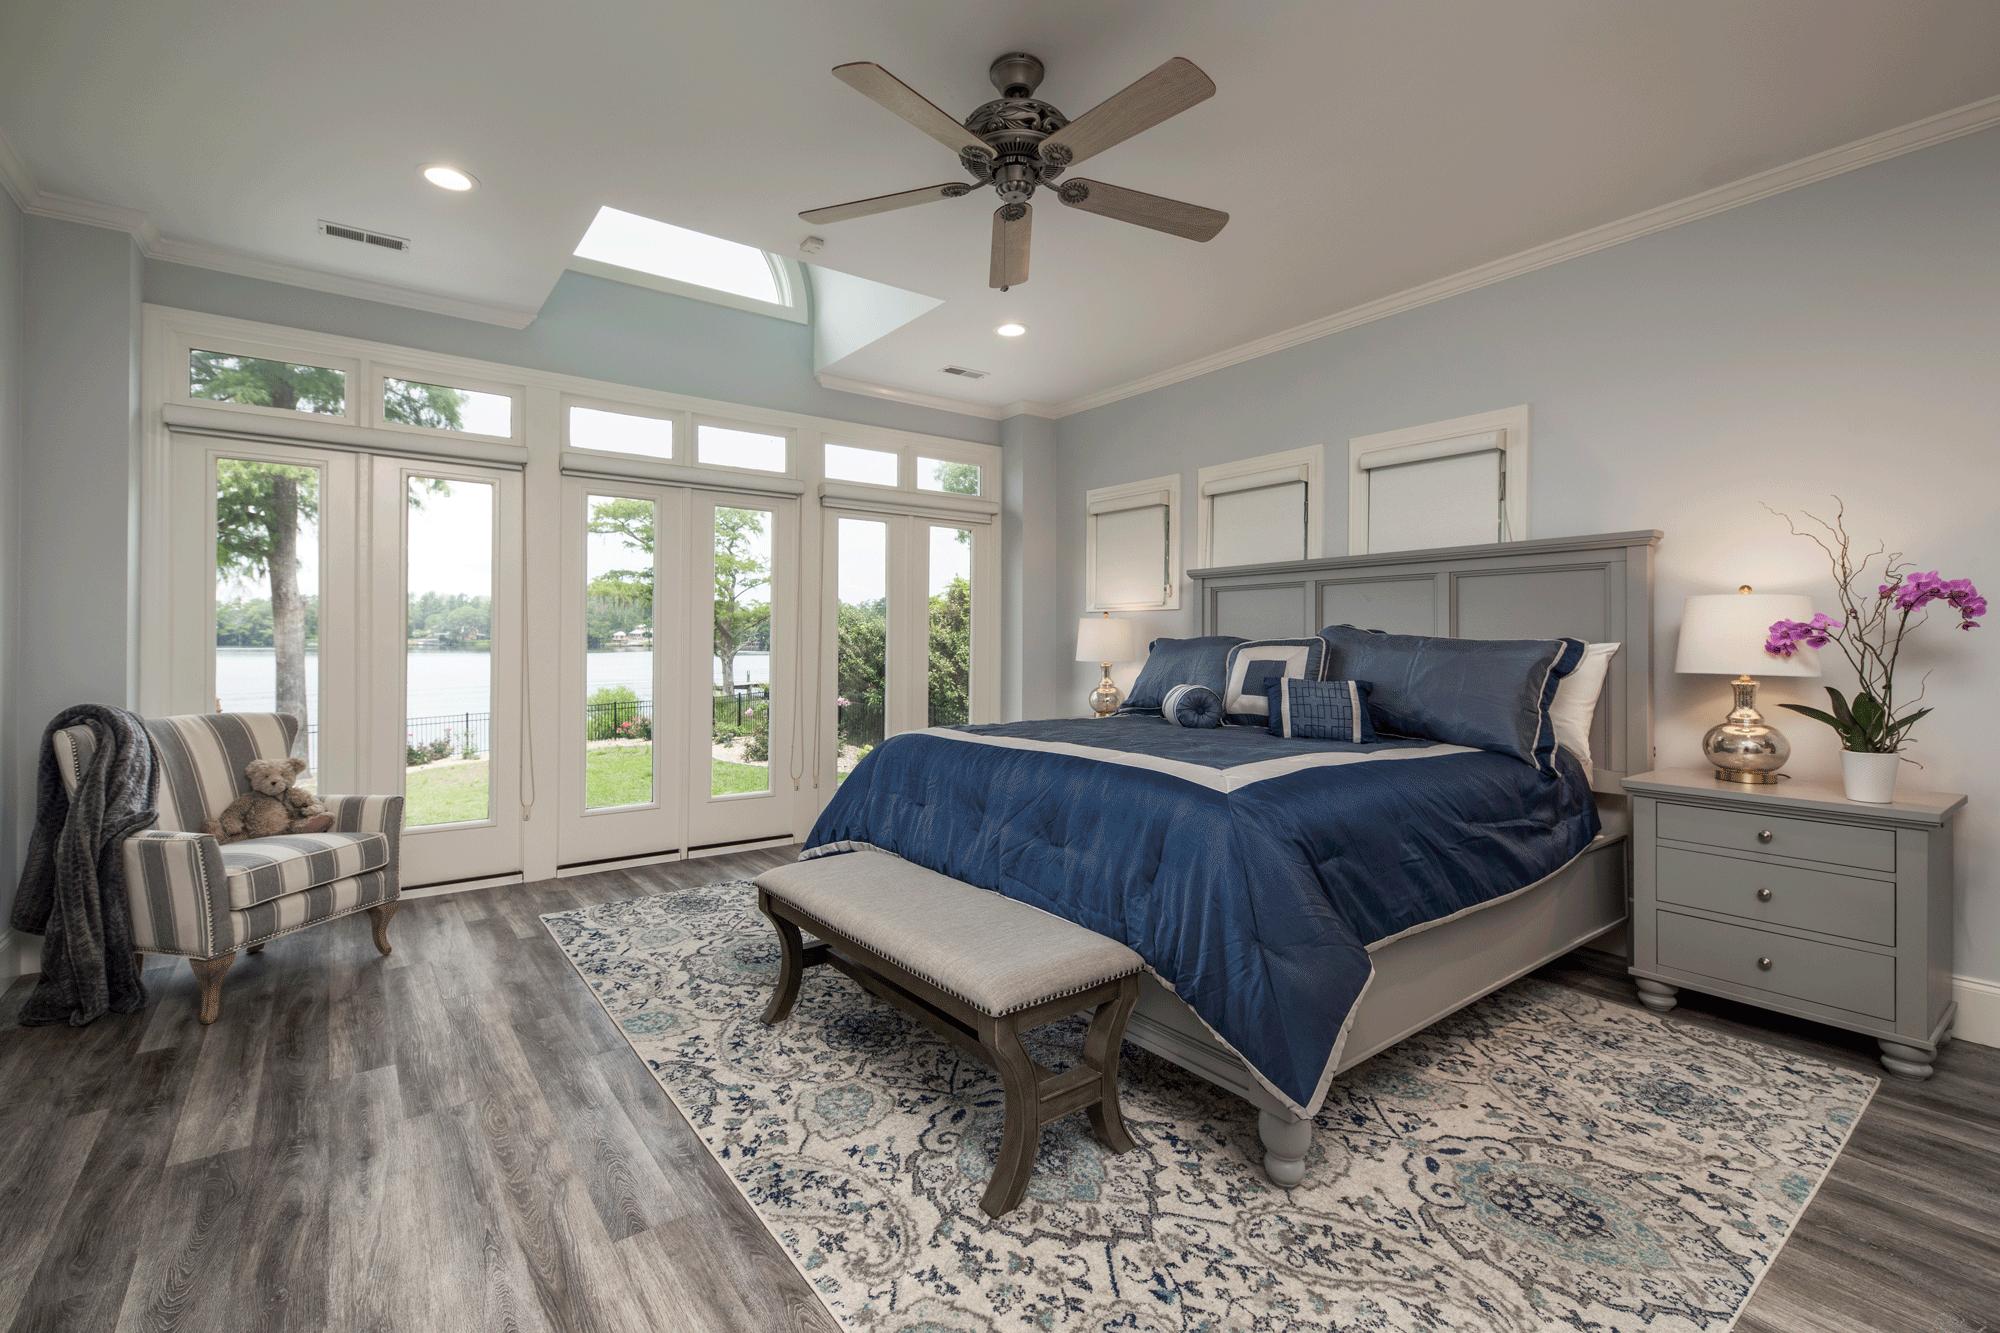 bedroom interior design with furniture, decor, lighting